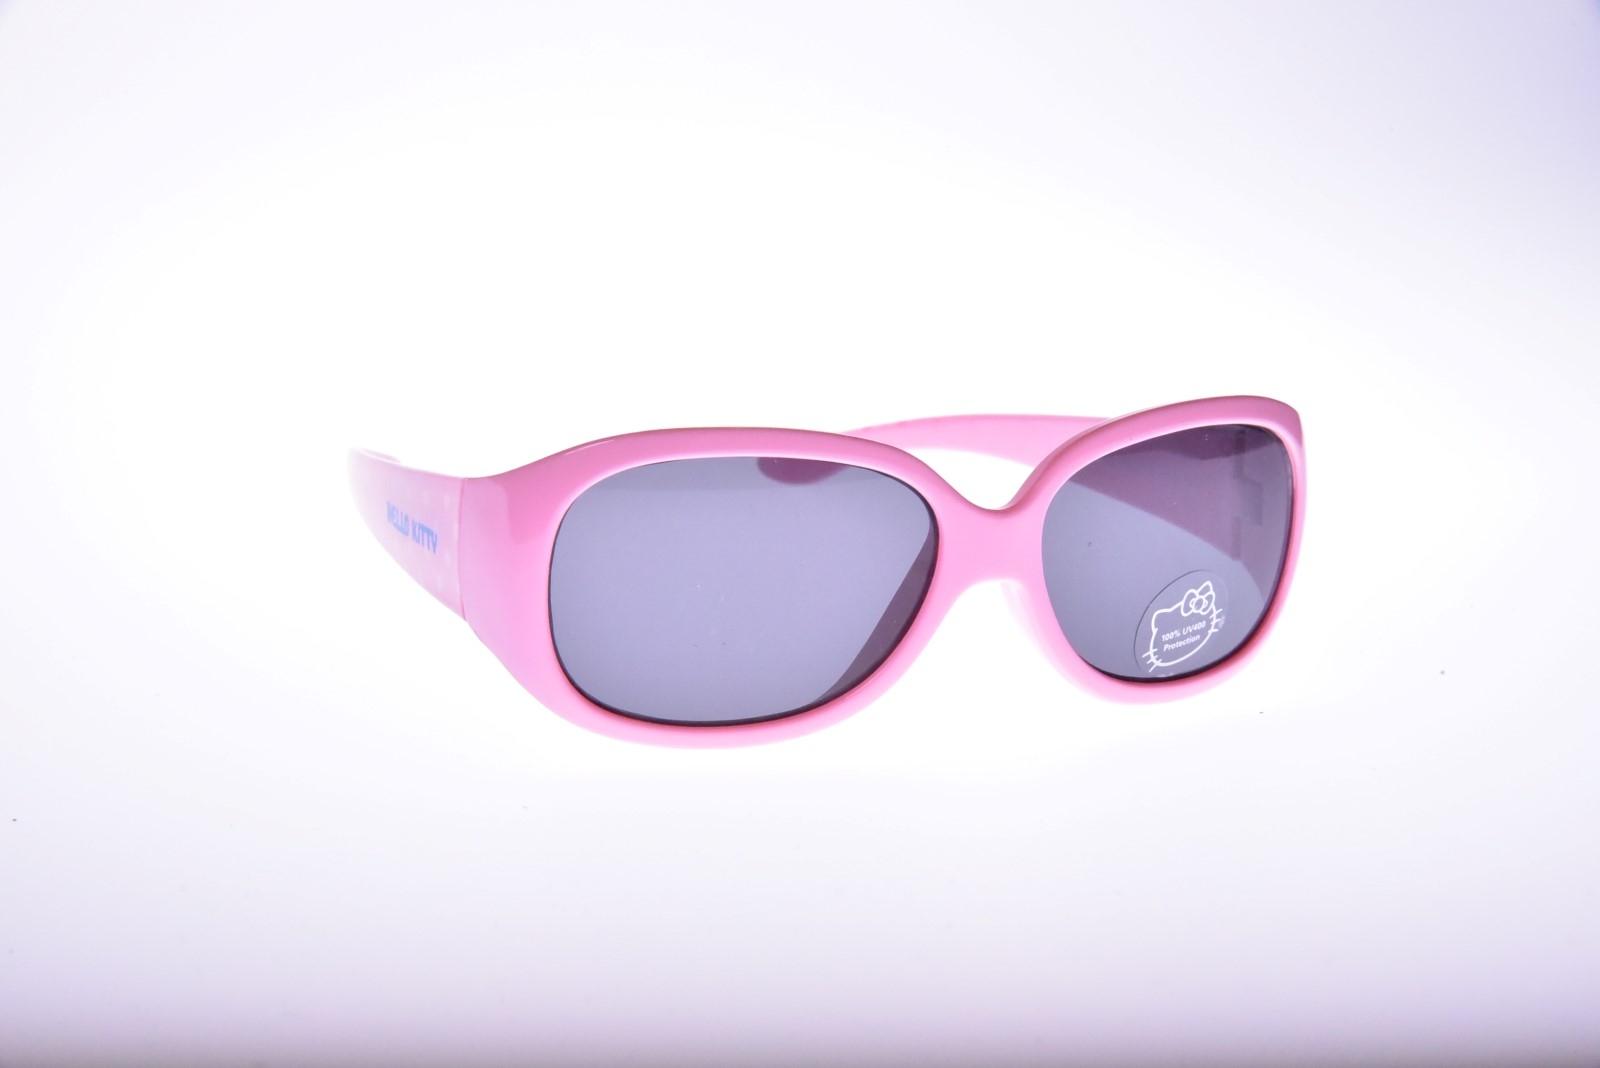 Polaroid Hello Kitty K6309B - Slnečné okuliare pre deti 4-7 r.